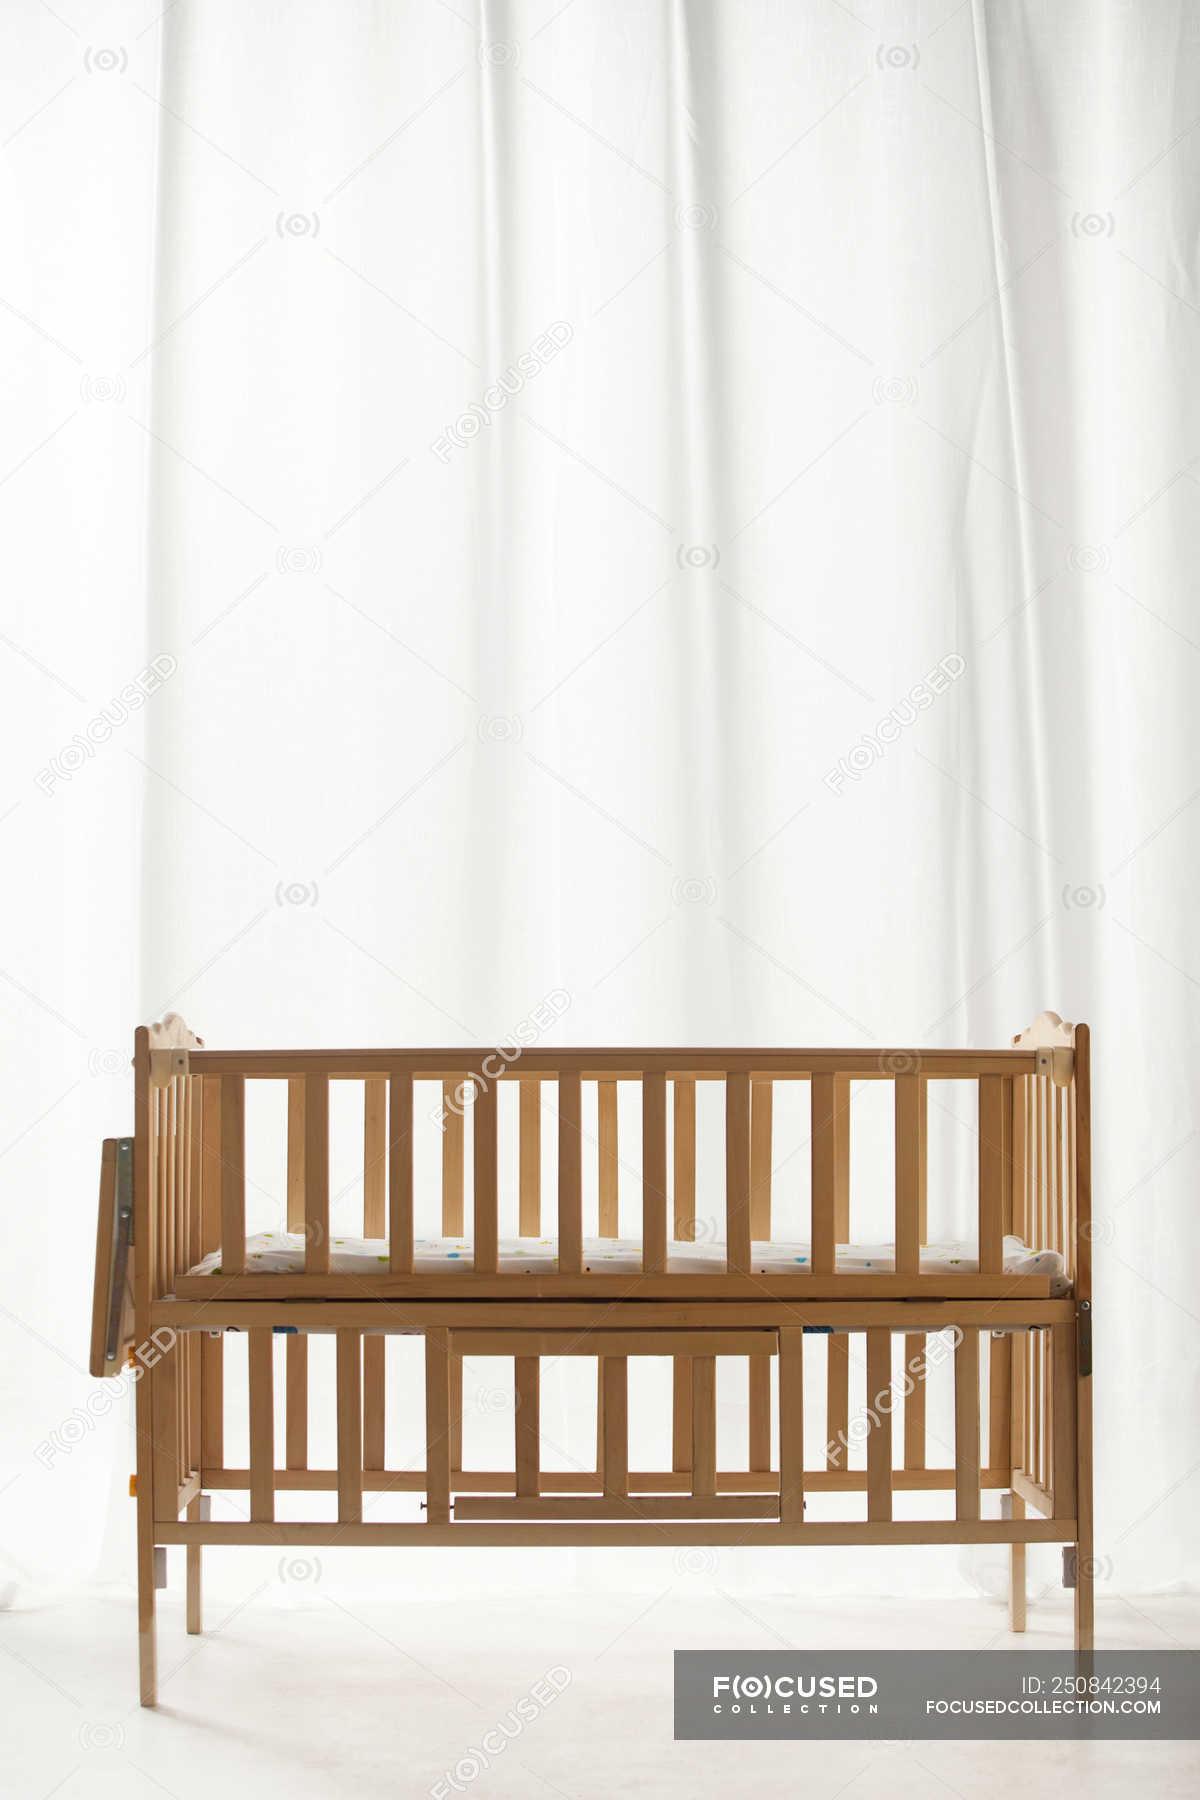 Brown Wooden Baby Bed In Empty Light Room Interior Nursery Childish Stock Photo 250842394